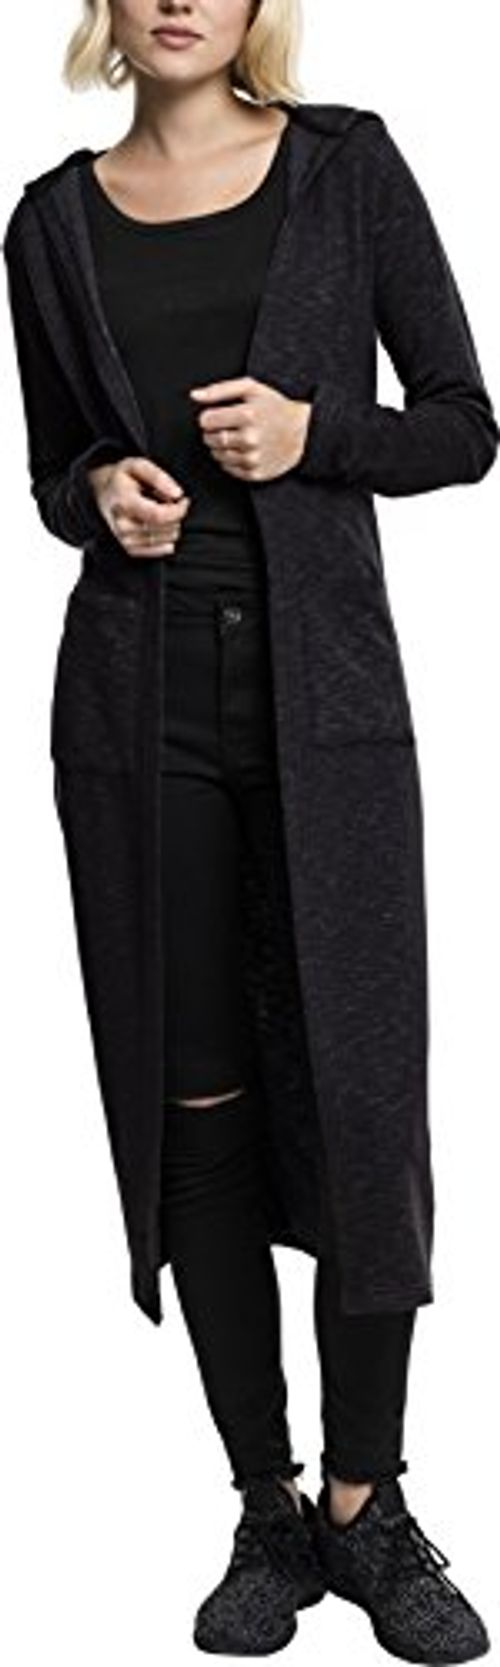 photo Wallpaper of Urban Classics-Urban Classics Damen Strickjacke Ladies Space Dye Hooded Cardigan-Schwarz Meliert